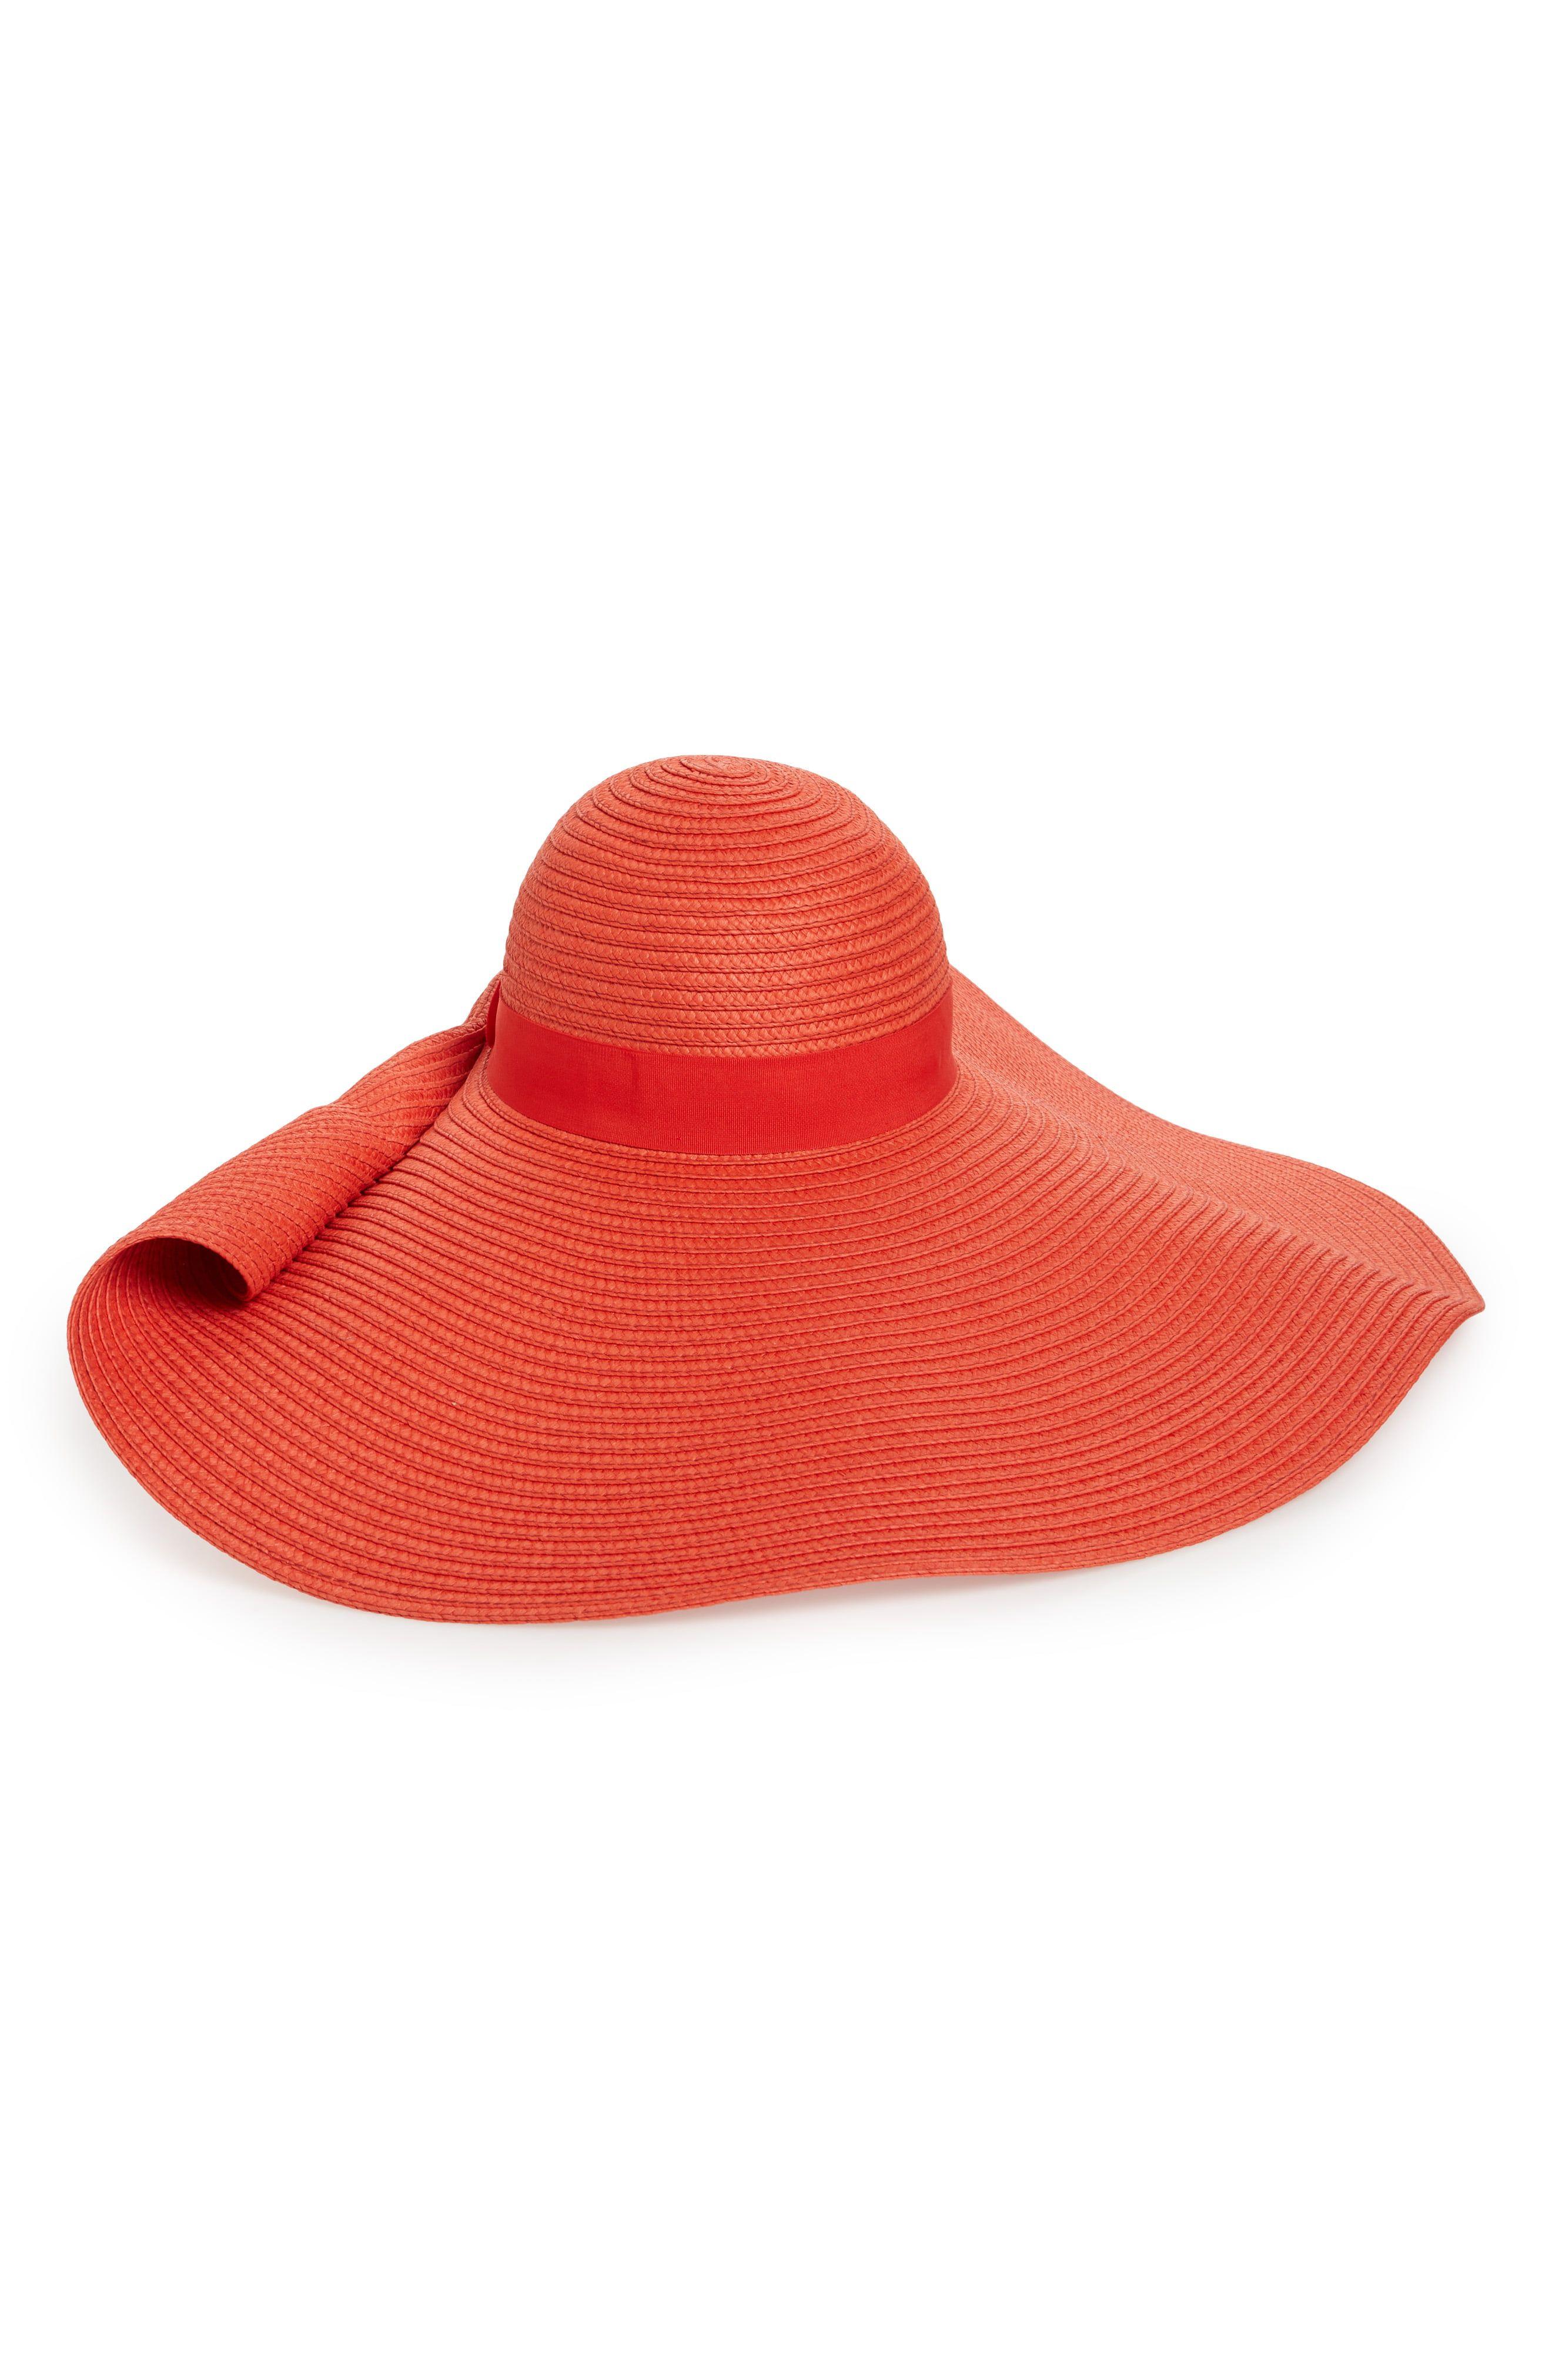 c0b4449c1 Women's Nordstrom Drama Floppy Brim Straw Sun Hat - Red Sun Hats, Drama,  Sombreros